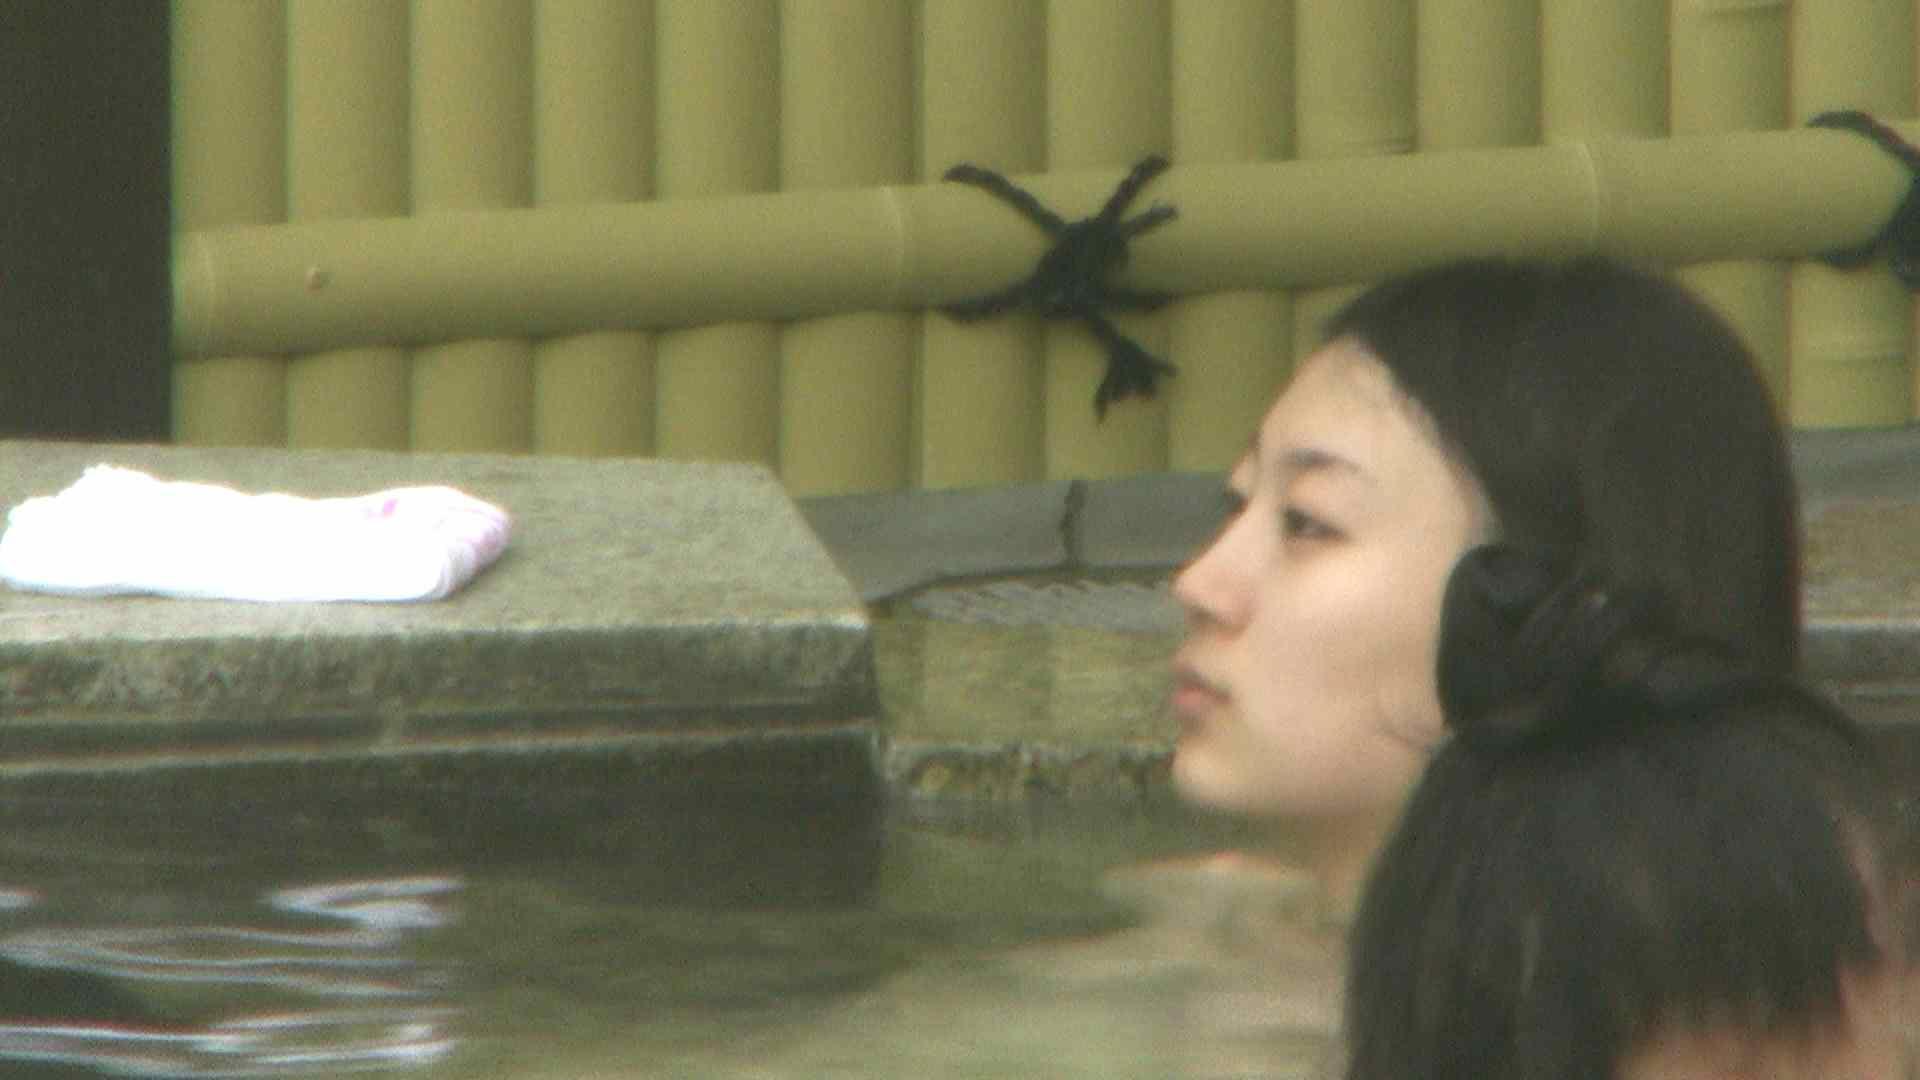 Aquaな露天風呂Vol.123 盗撮師作品 エロ画像 105pic 2